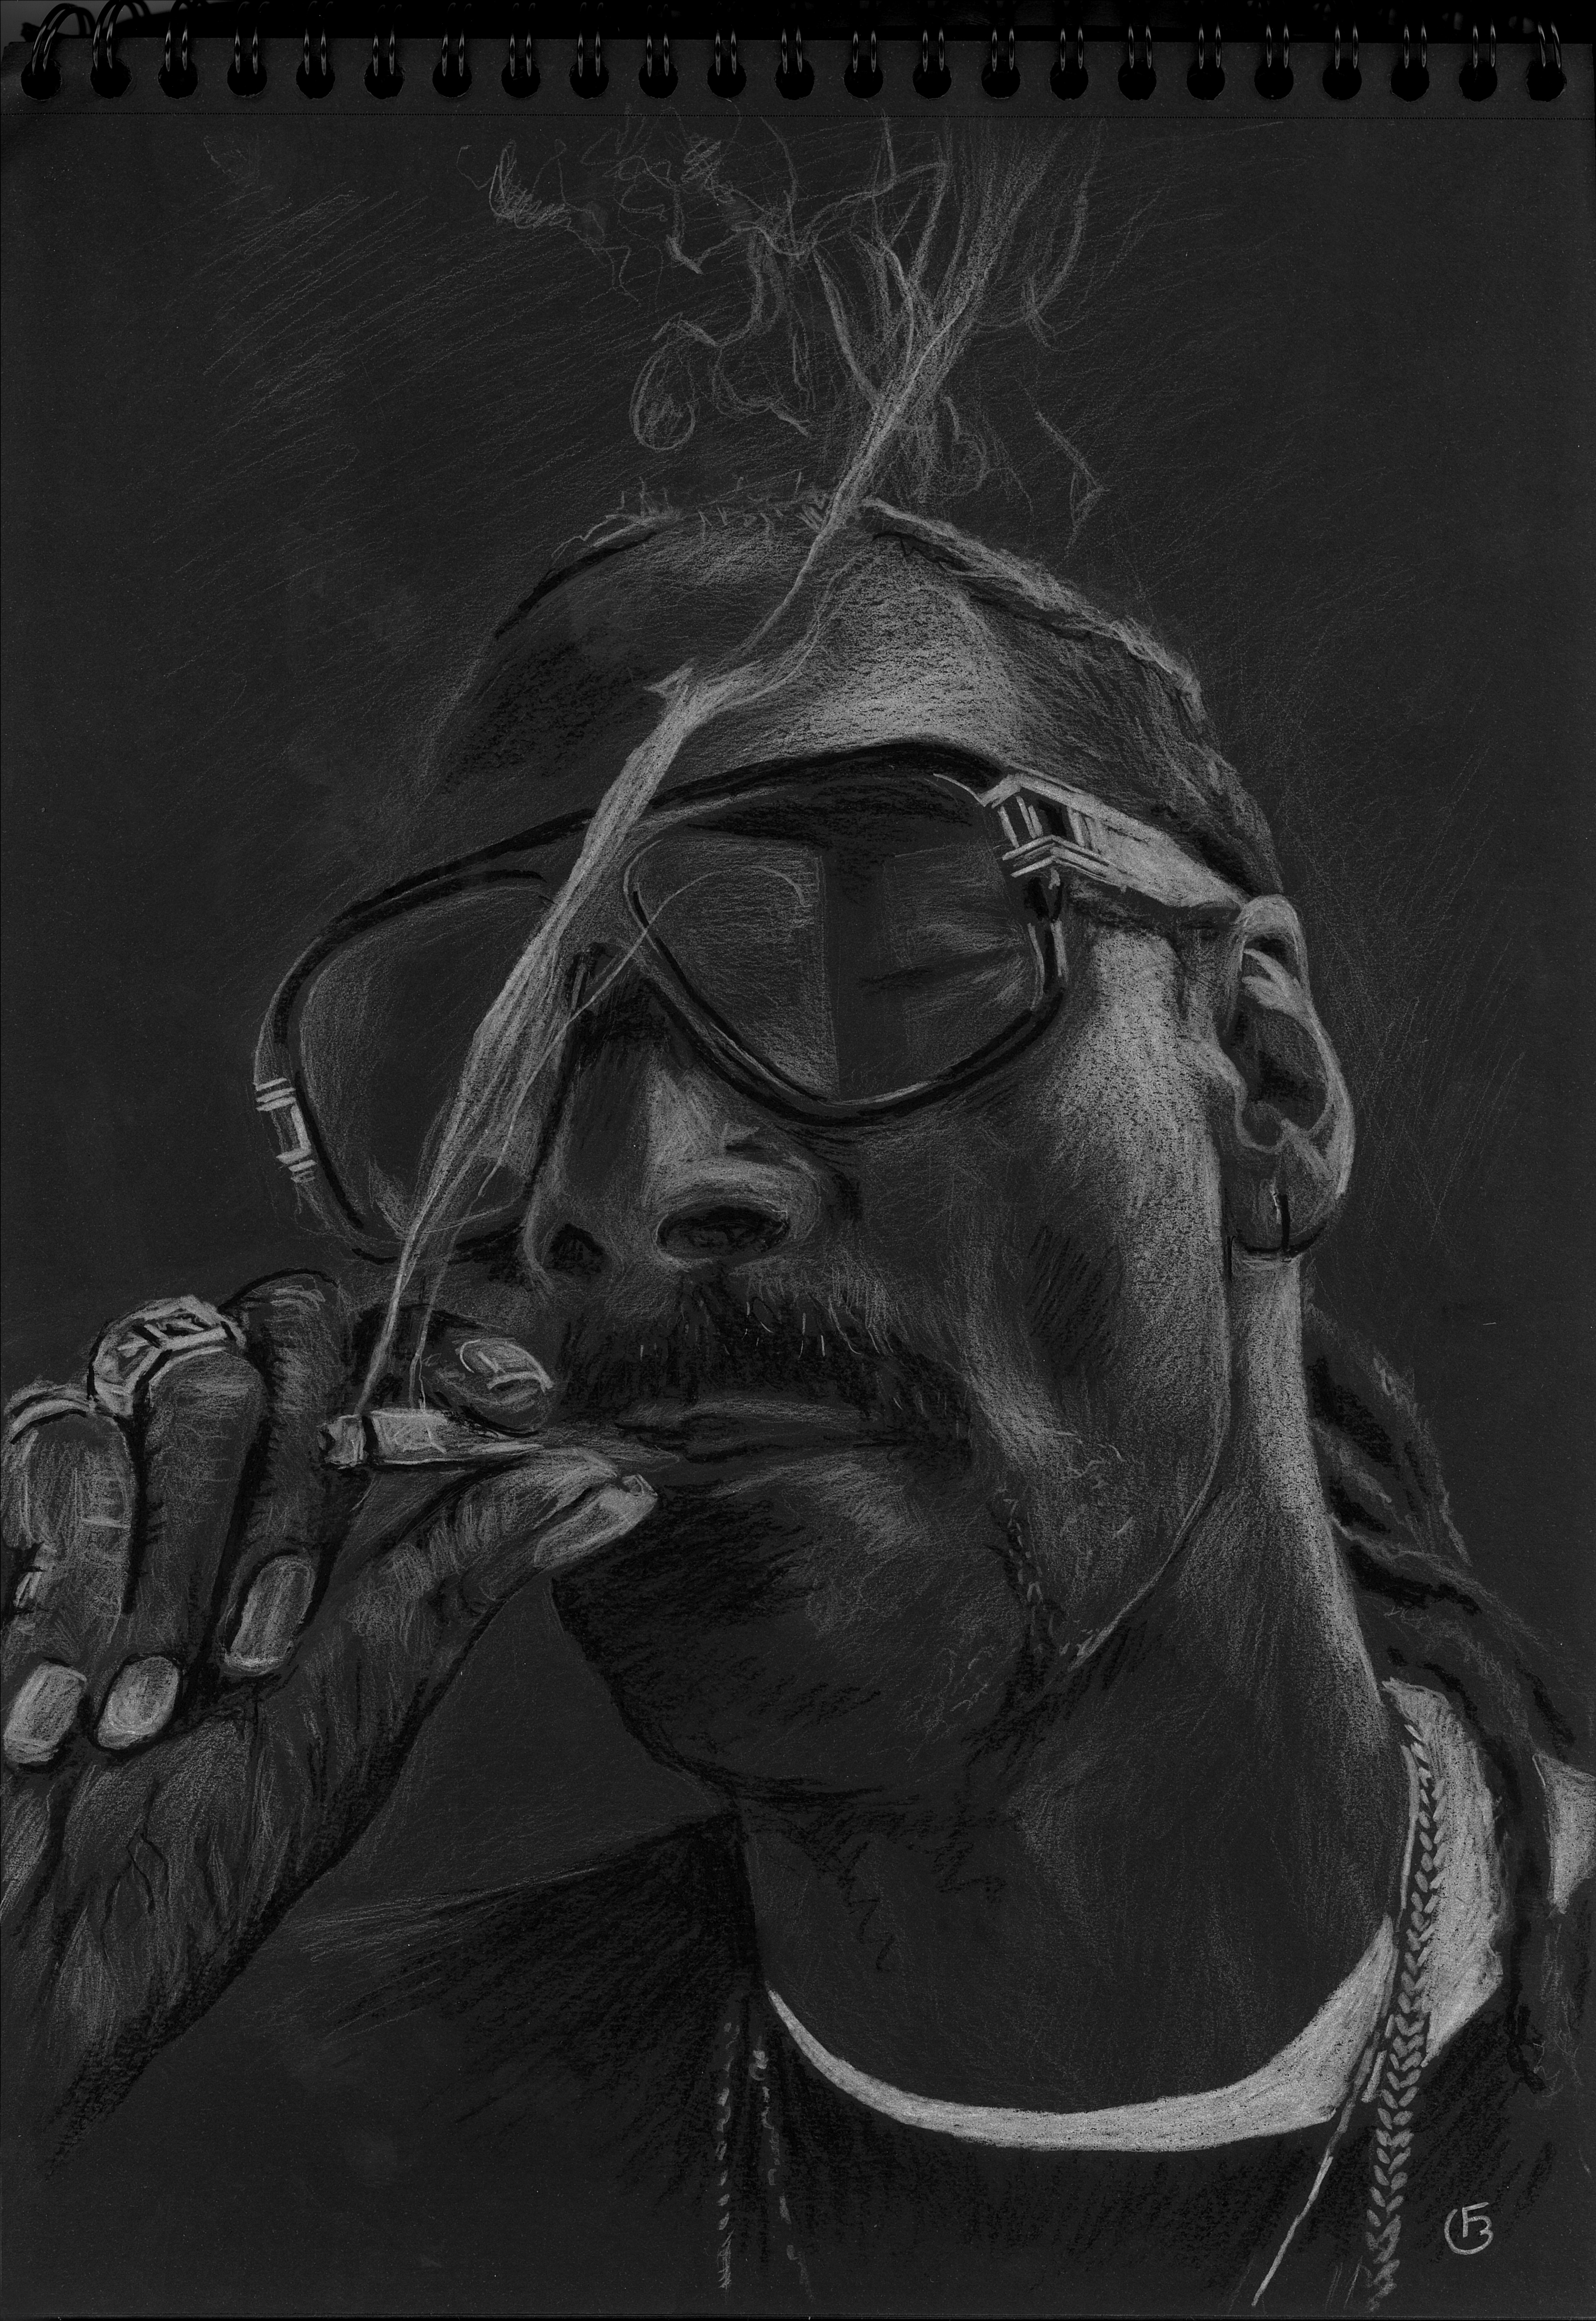 Snoop dog portrait dessin